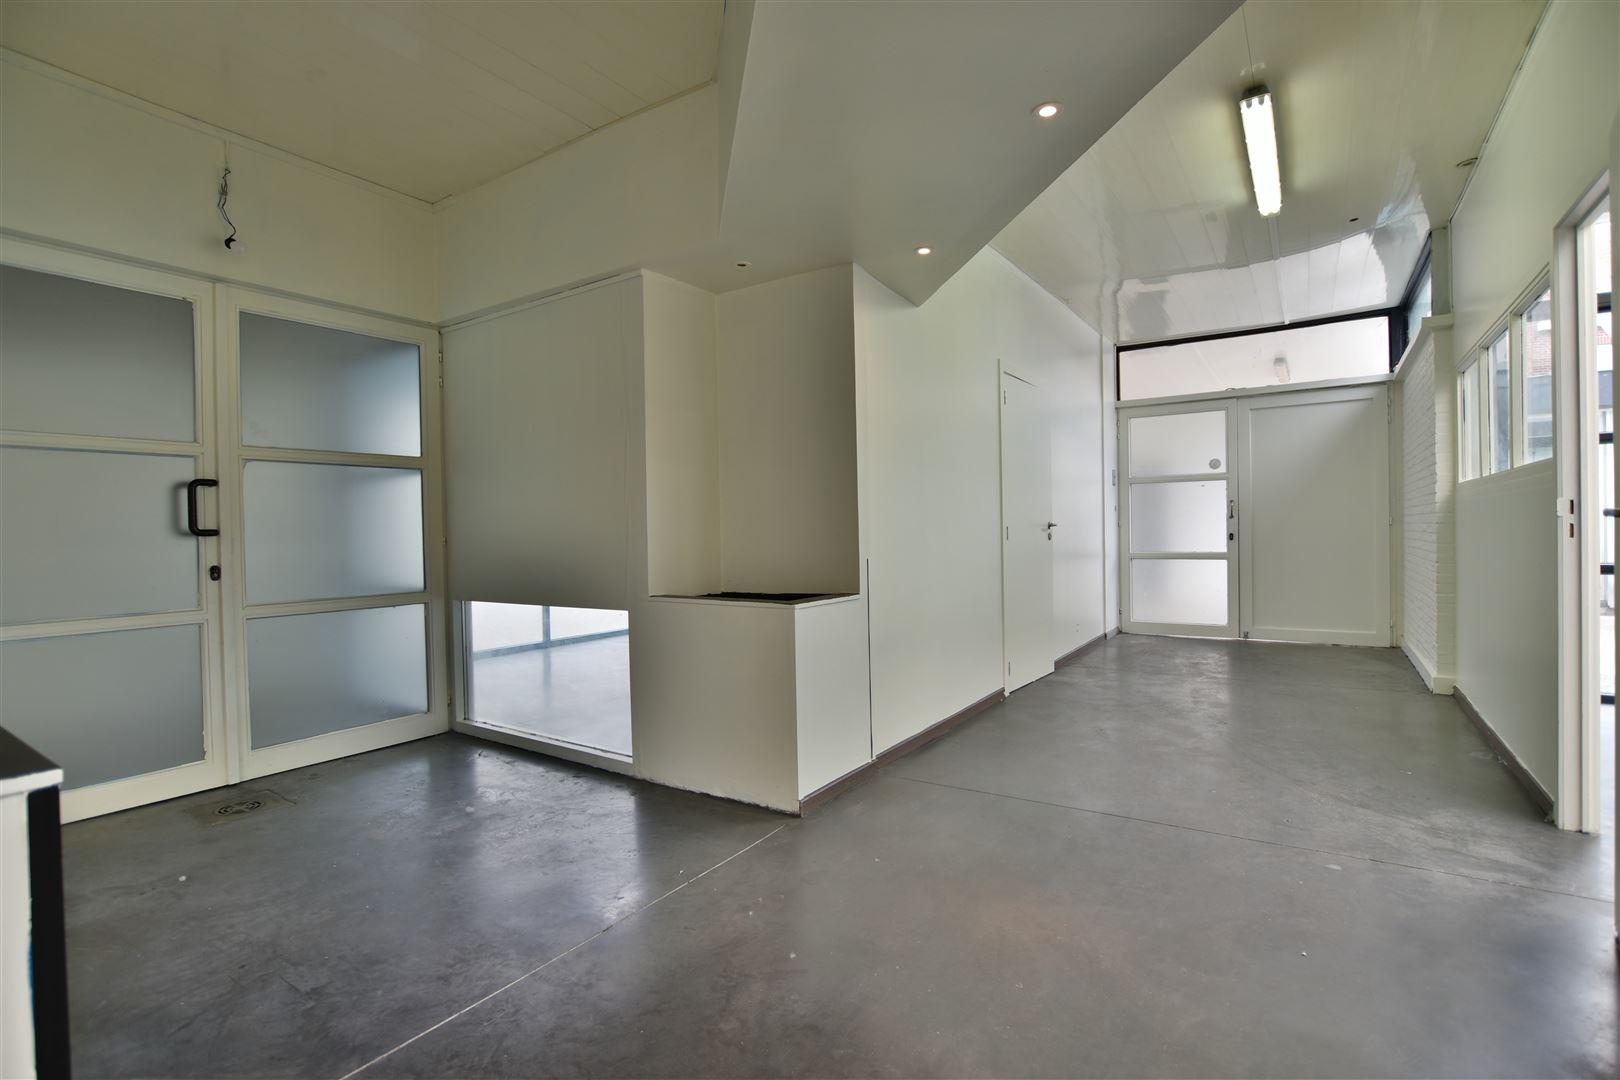 Foto 2 : Kantoorruimte te 9220 HAMME (België) - Prijs € 1.600